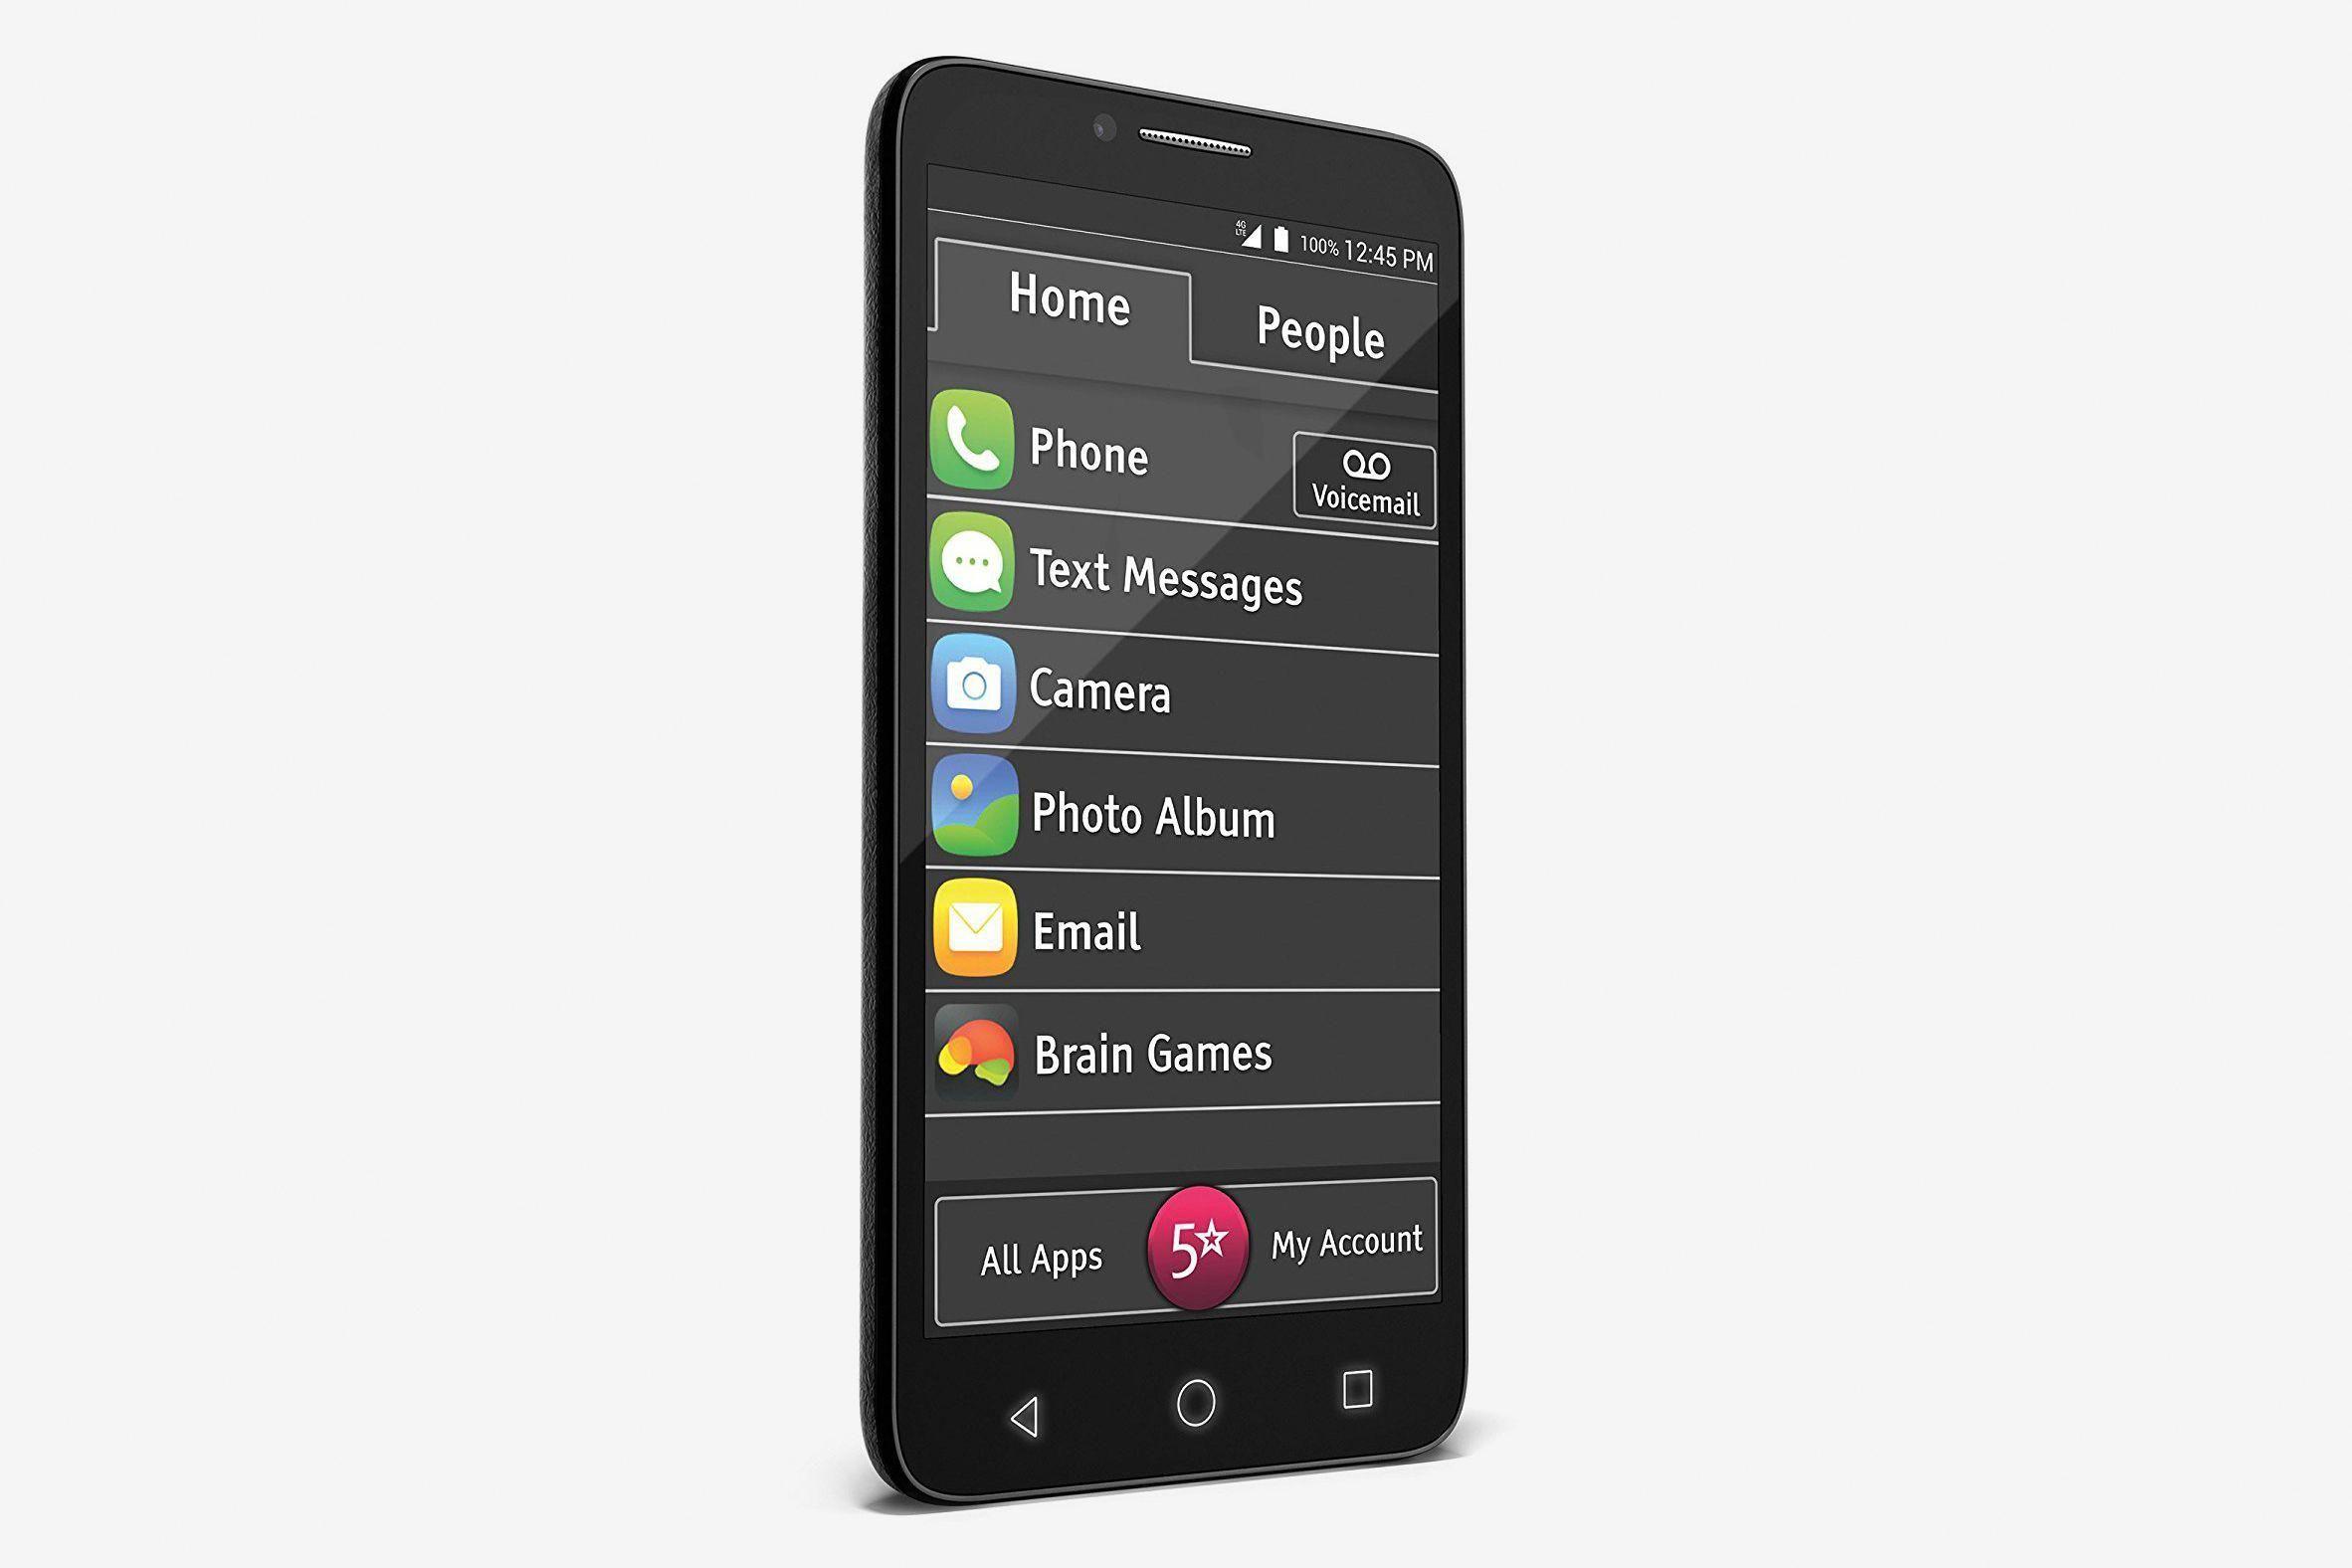 48f1a526437b5465b879f5d928ee8fa4 - How To Get A Free Phone From Sprint Insurance